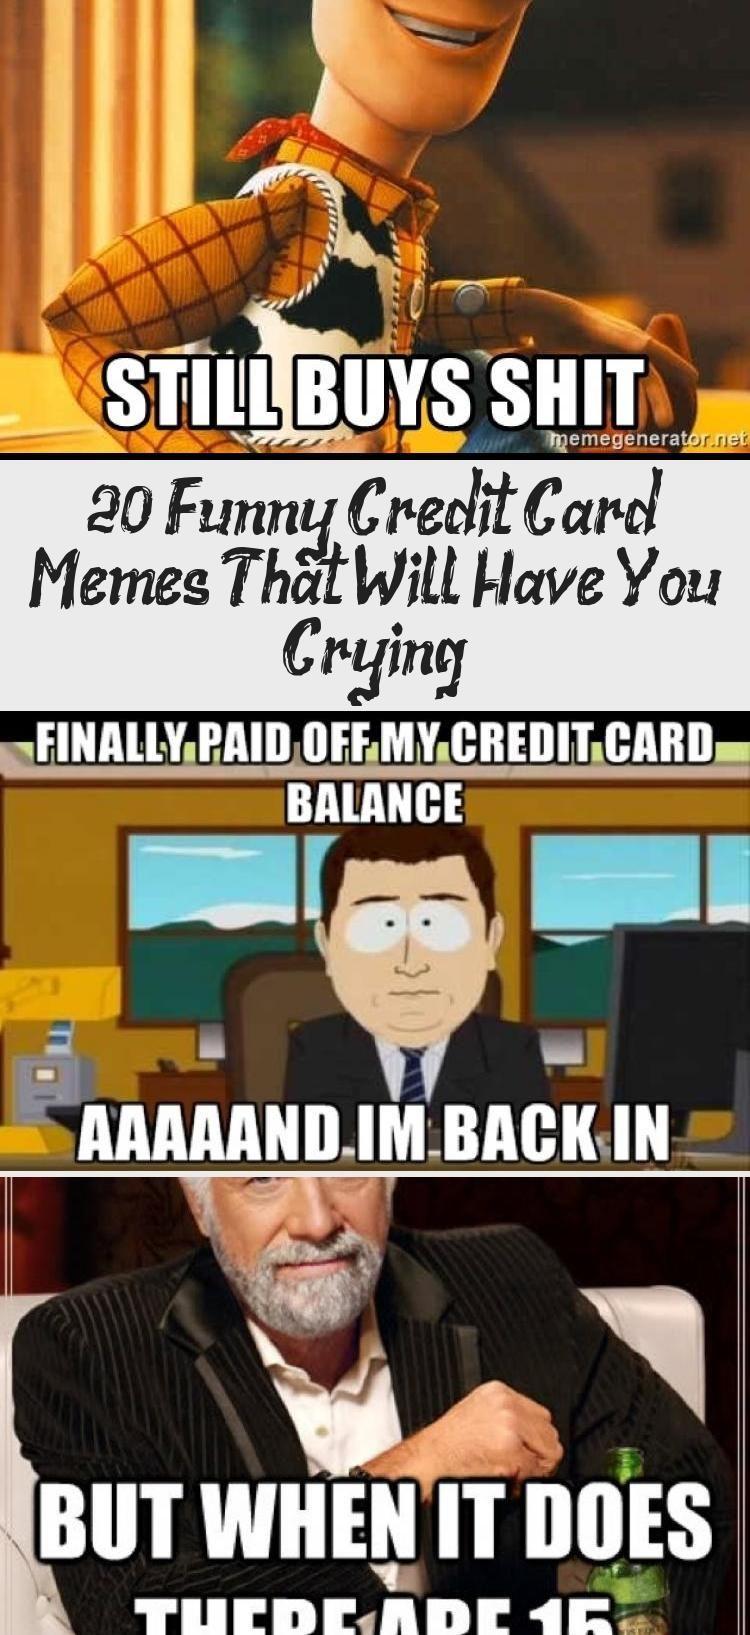 Credit Card Meme Creditcard 20 Funny Credit Card Memes That Will